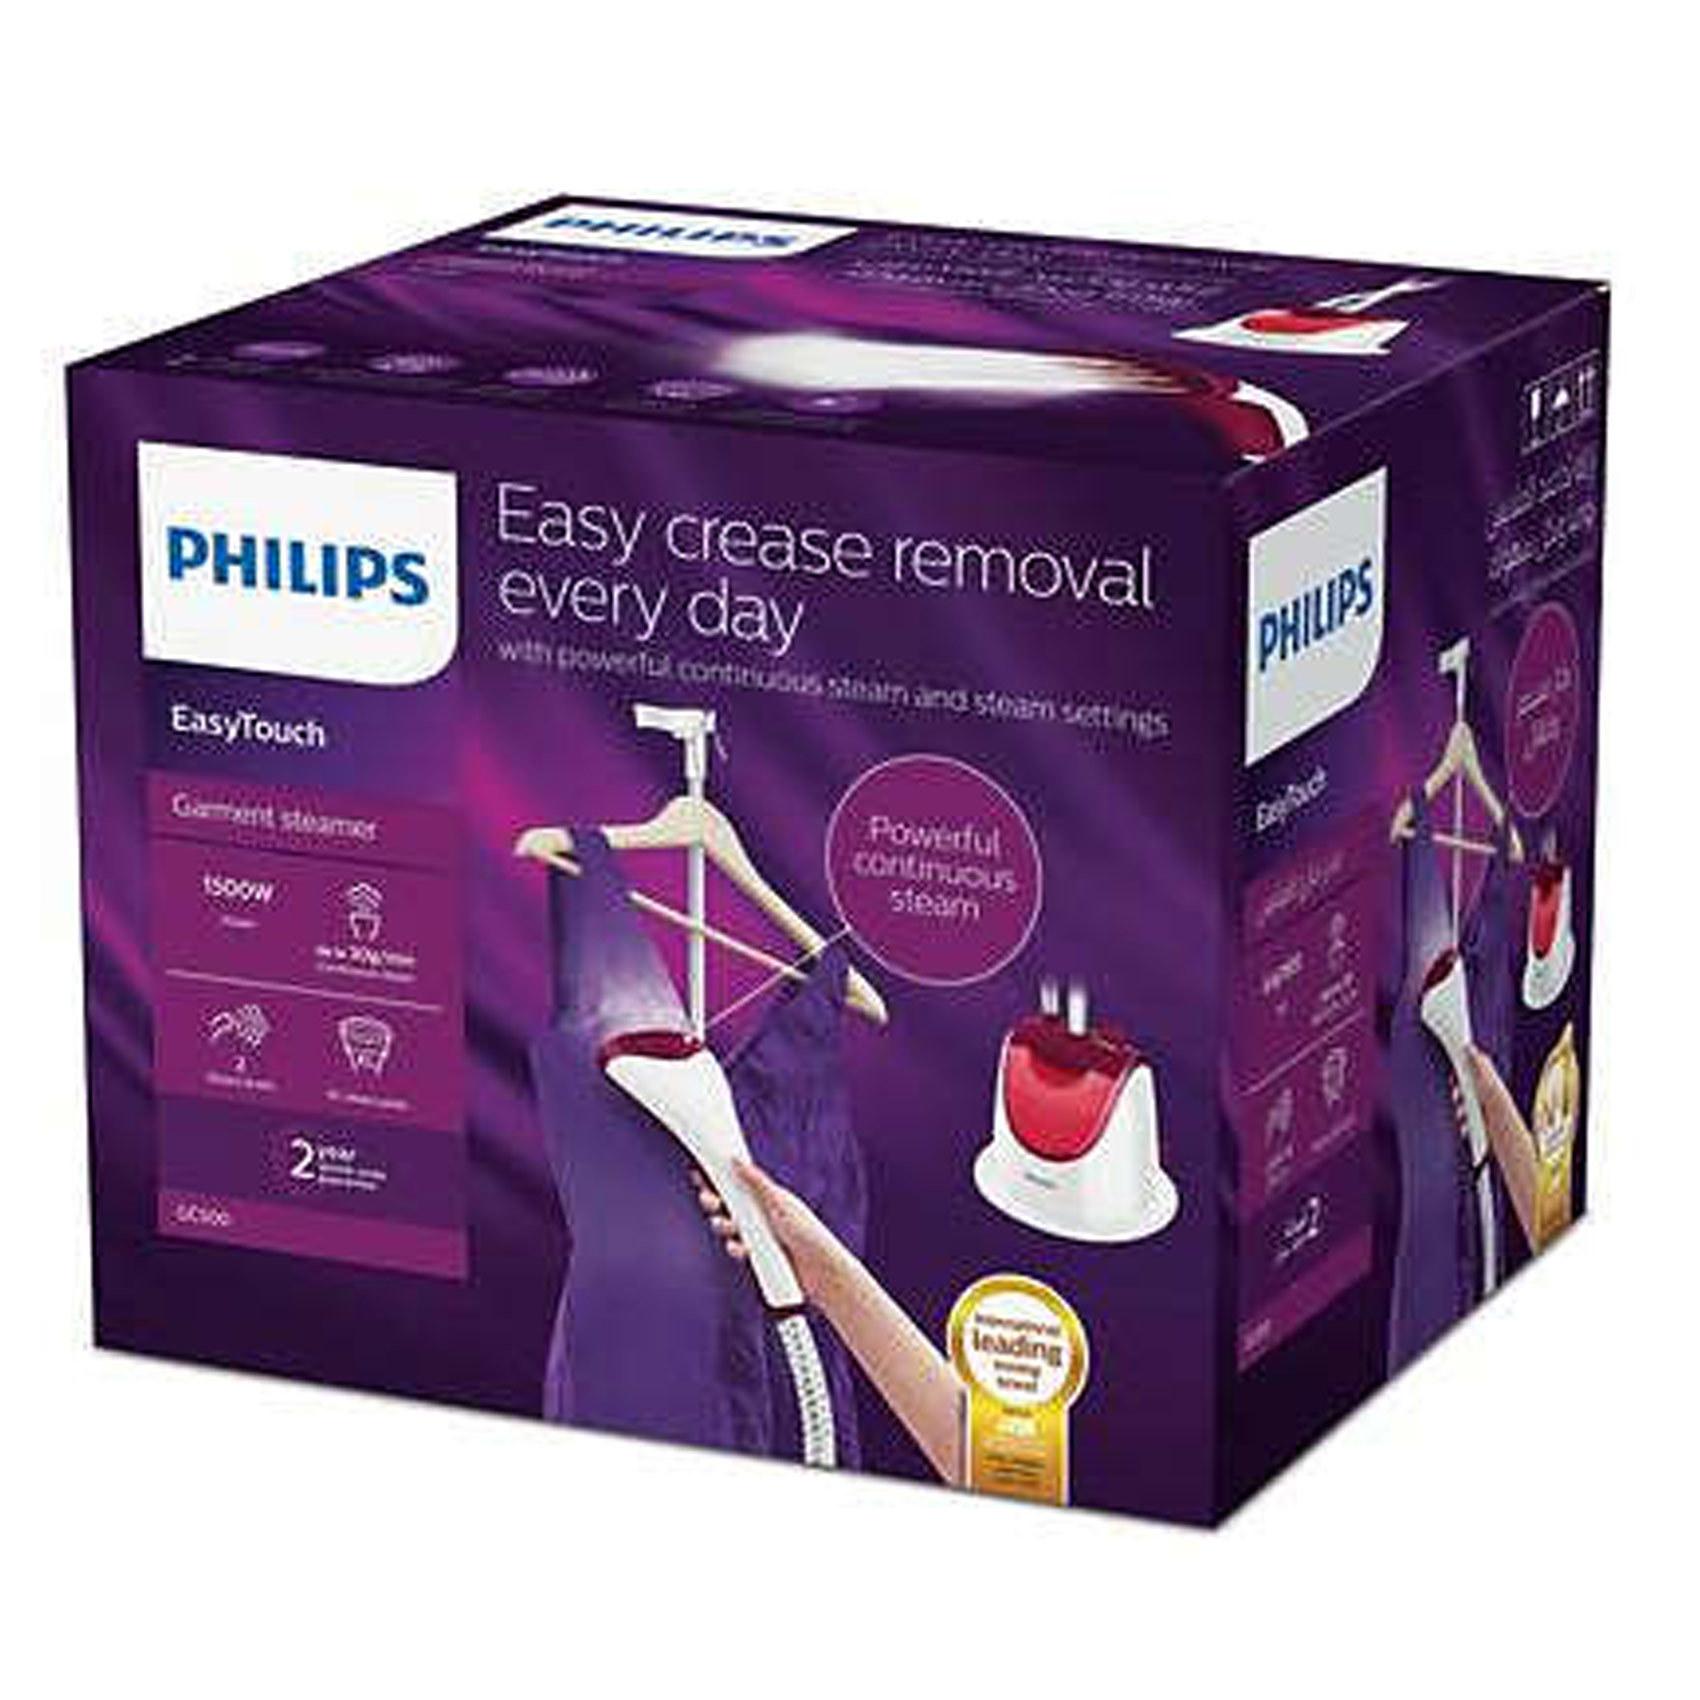 Buy Philips Garment Steamer Gc500 Online In Uae Carrefour Gc502